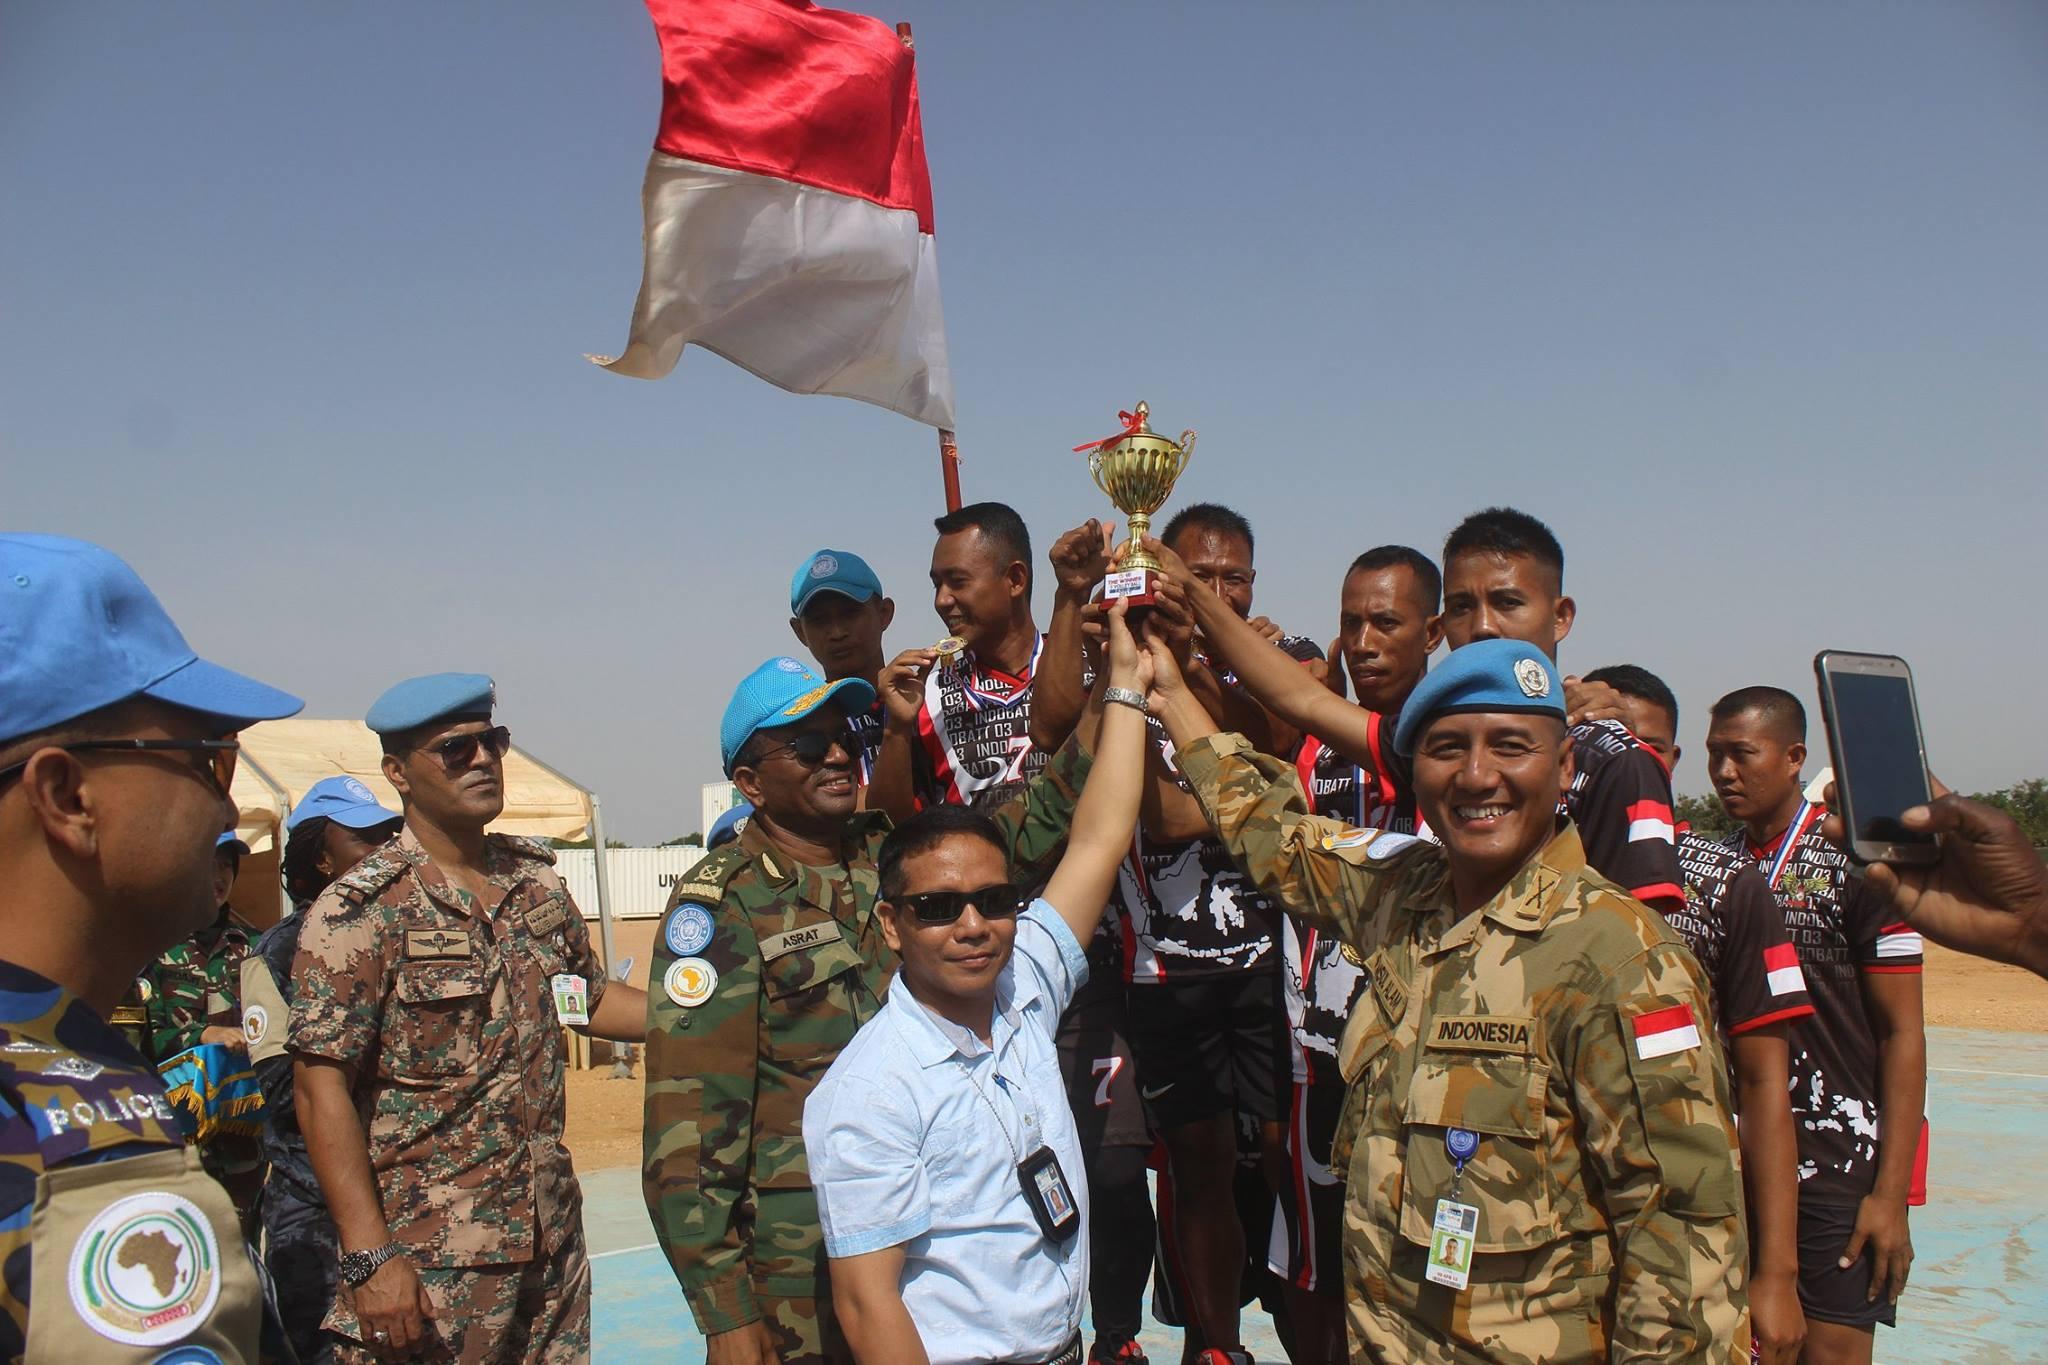 Pasukan Perdamaian TNI juara Pekan Olah Raga Unamid 2017 di Sudan